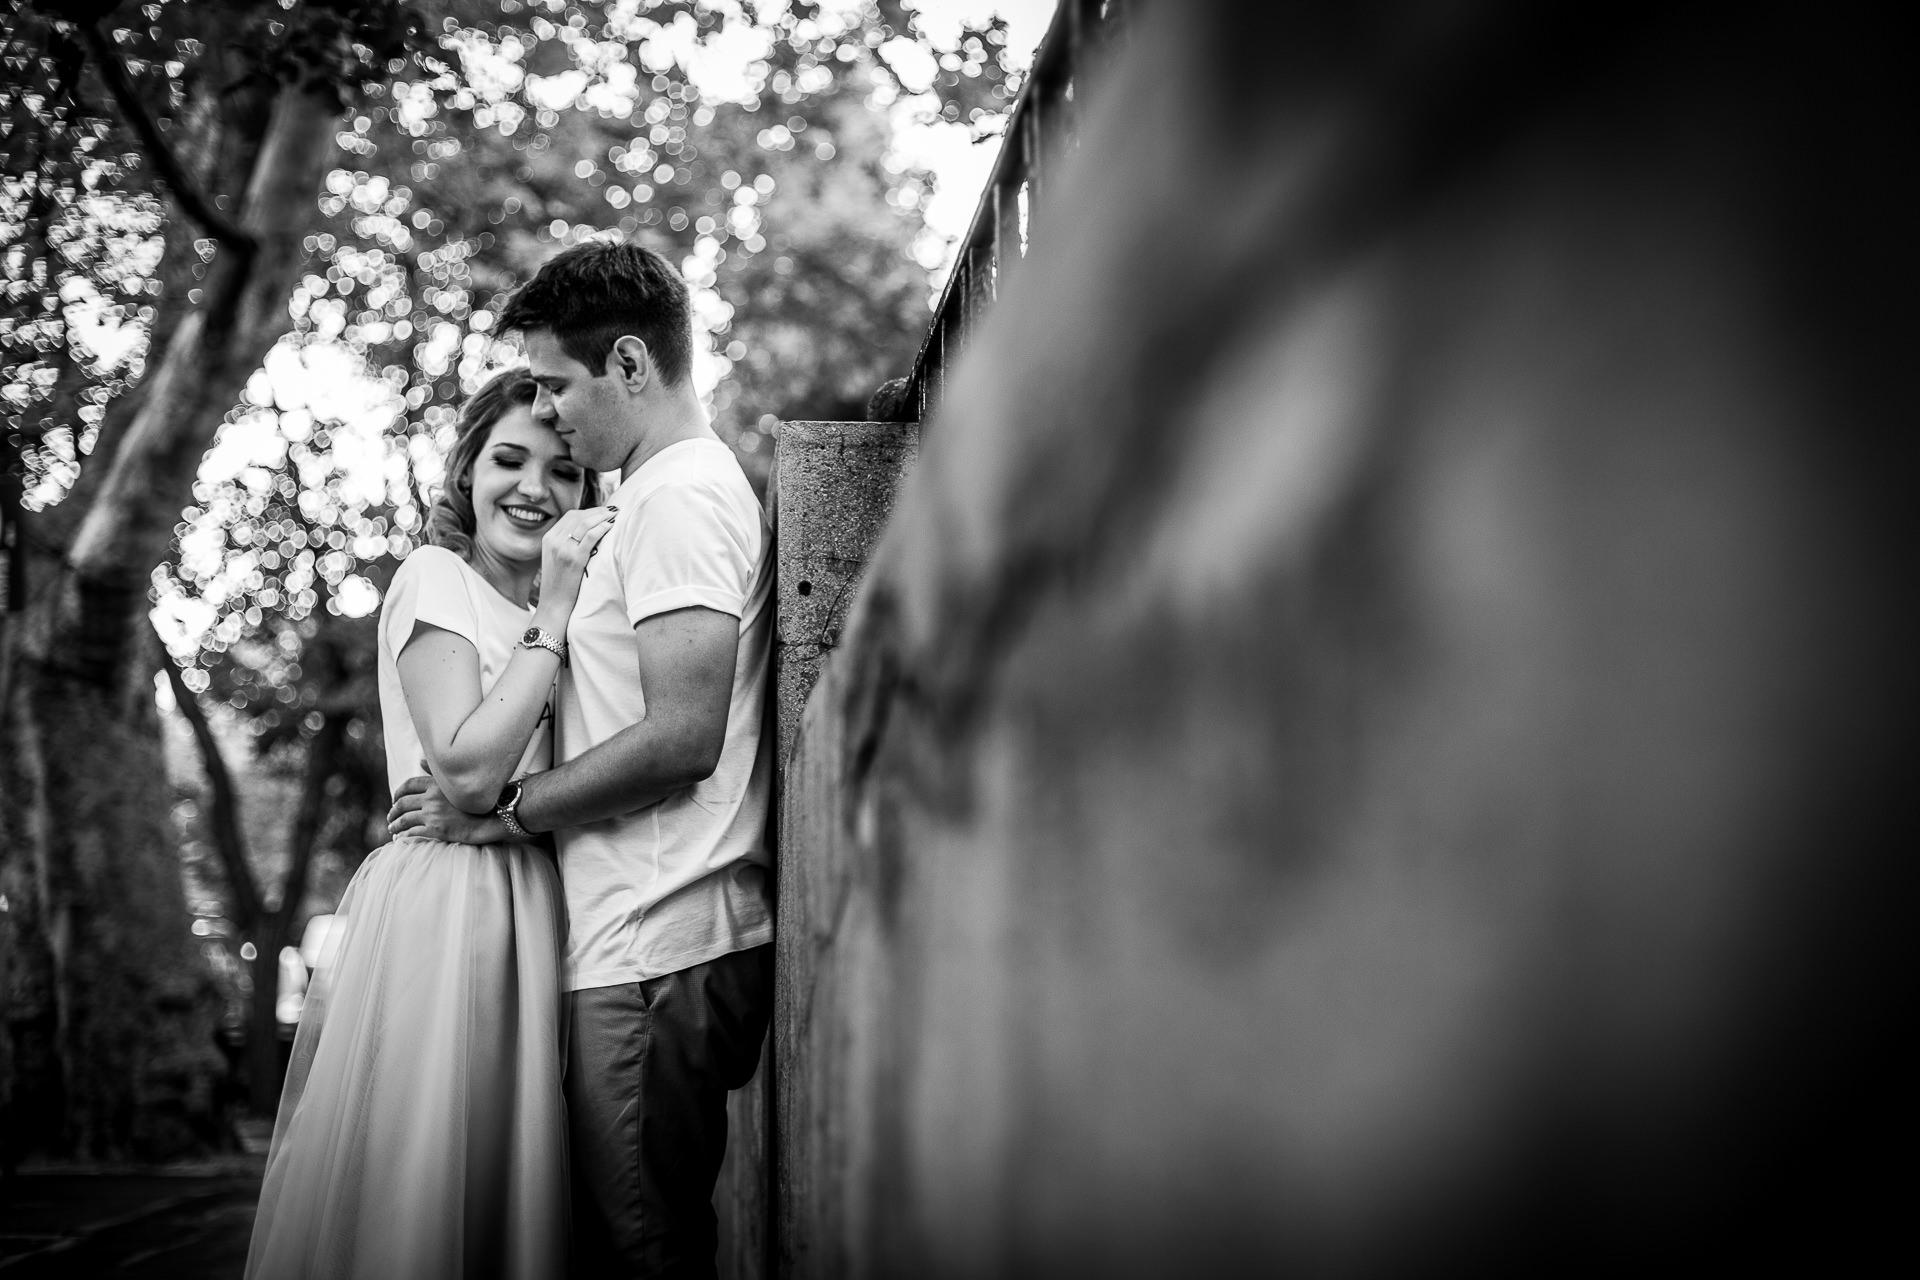 Sedinta foto Dorobanti / Strada Paris - Mihai Zaharia Photography - 16